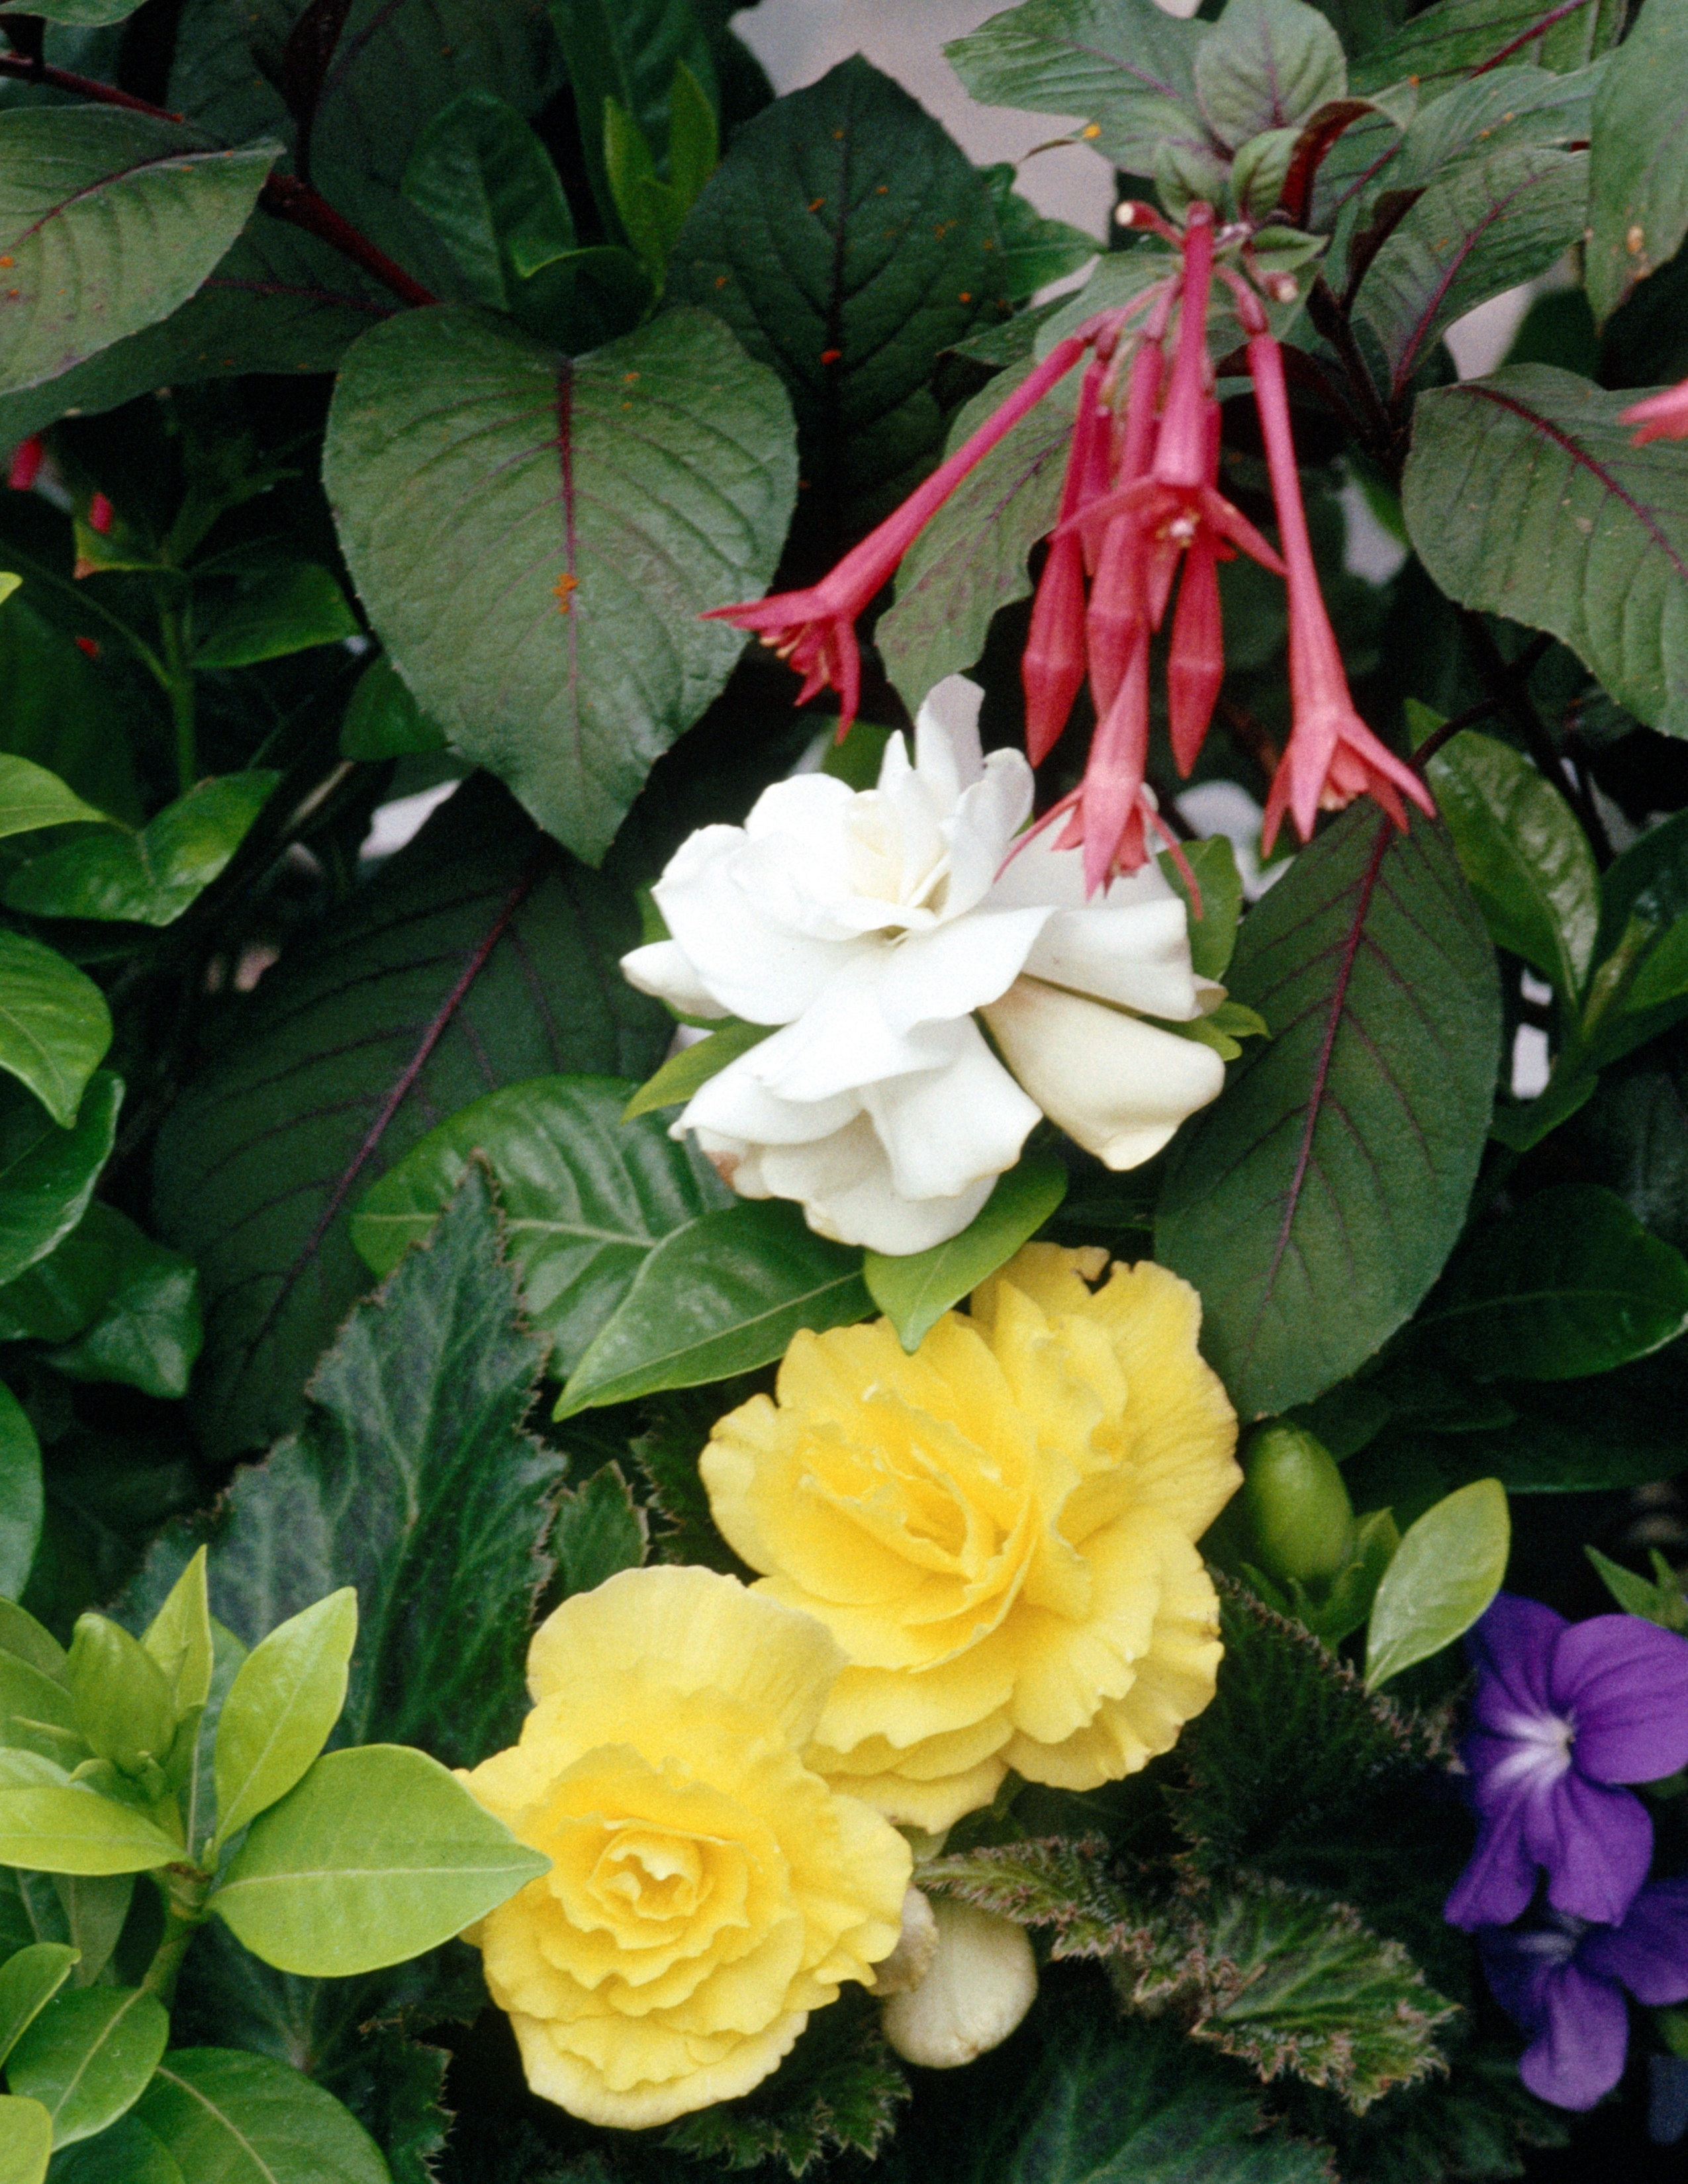 plantas de sombra para cultivar en macetas al aire libre ehow en espaol